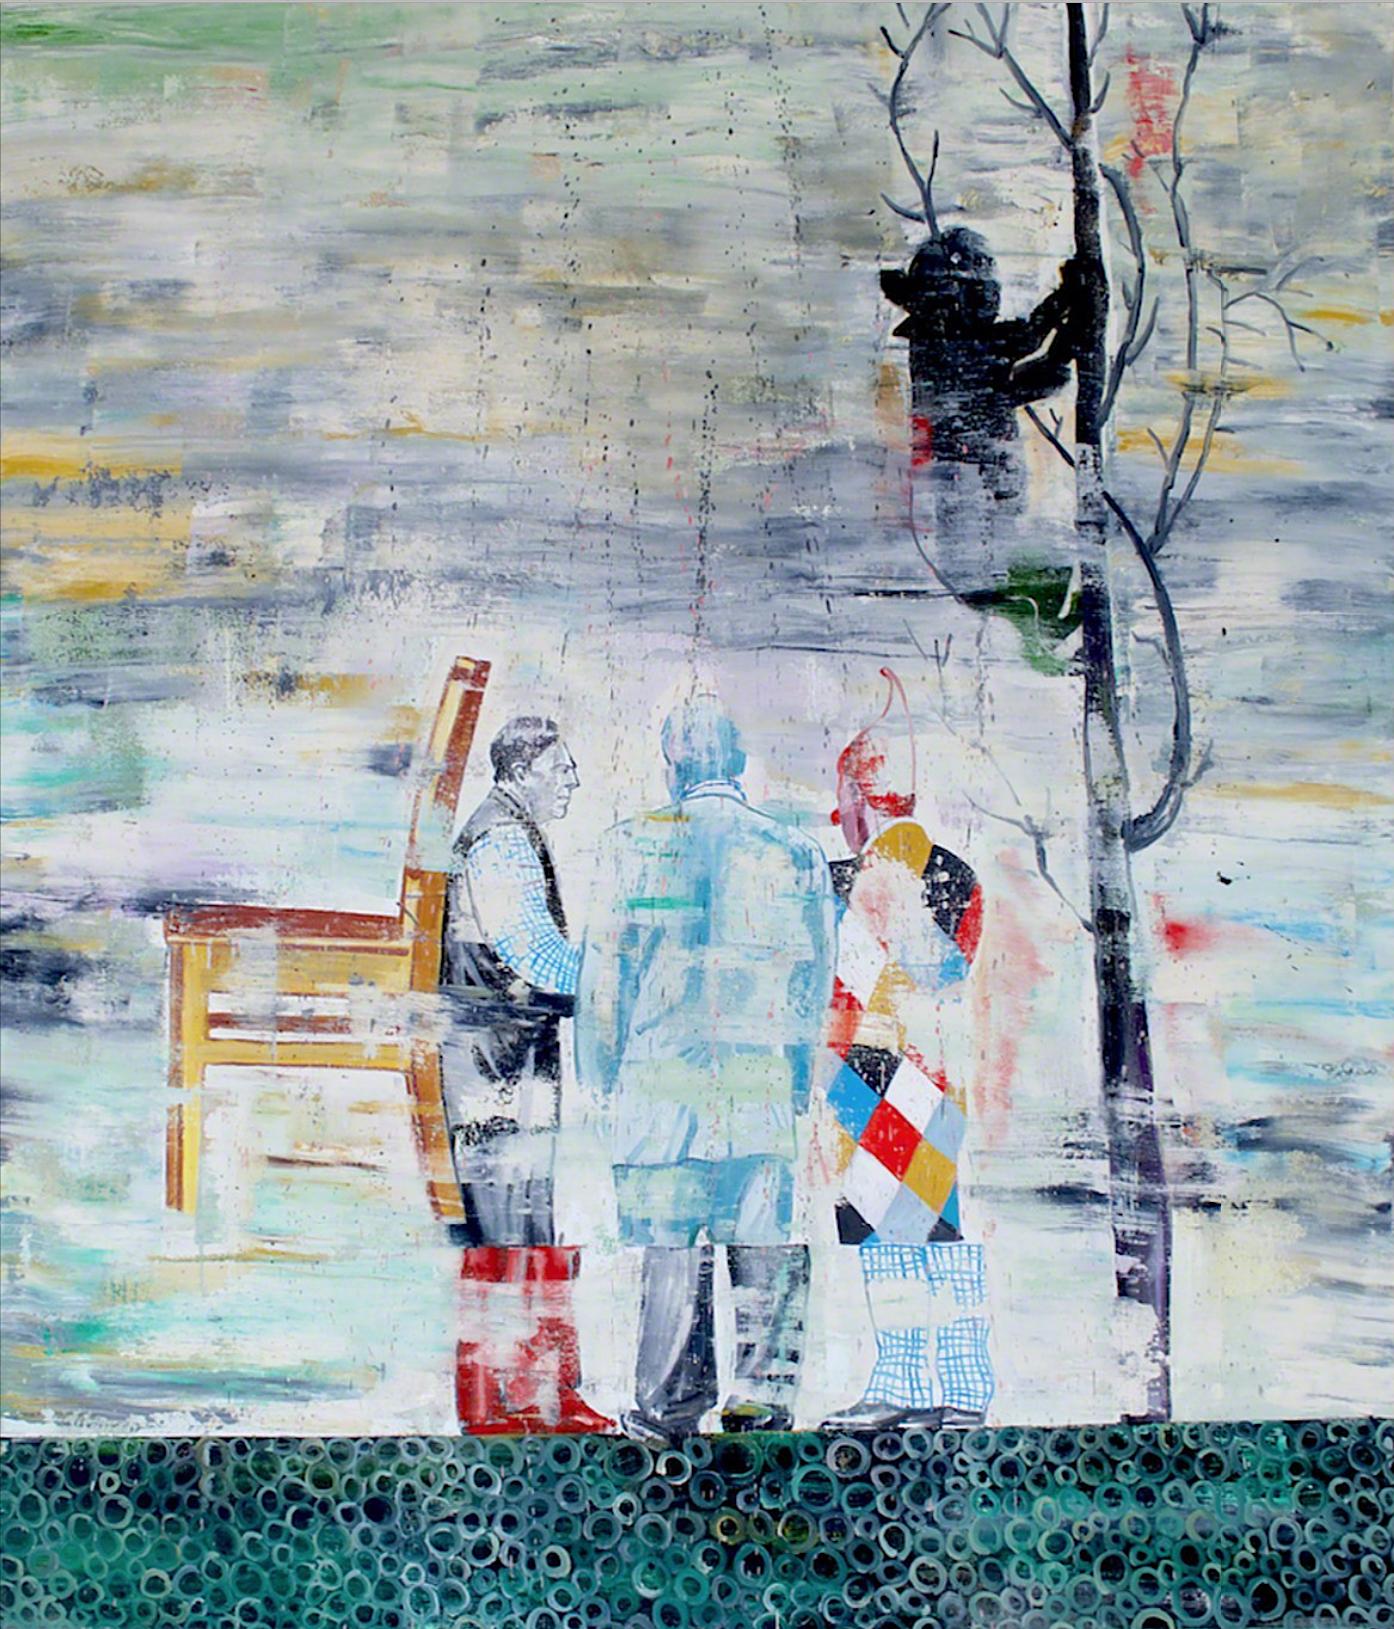 Nicky Nodjoumi, Shades of Jubilation, oil on canvas, 58 x 138 cm, 2011